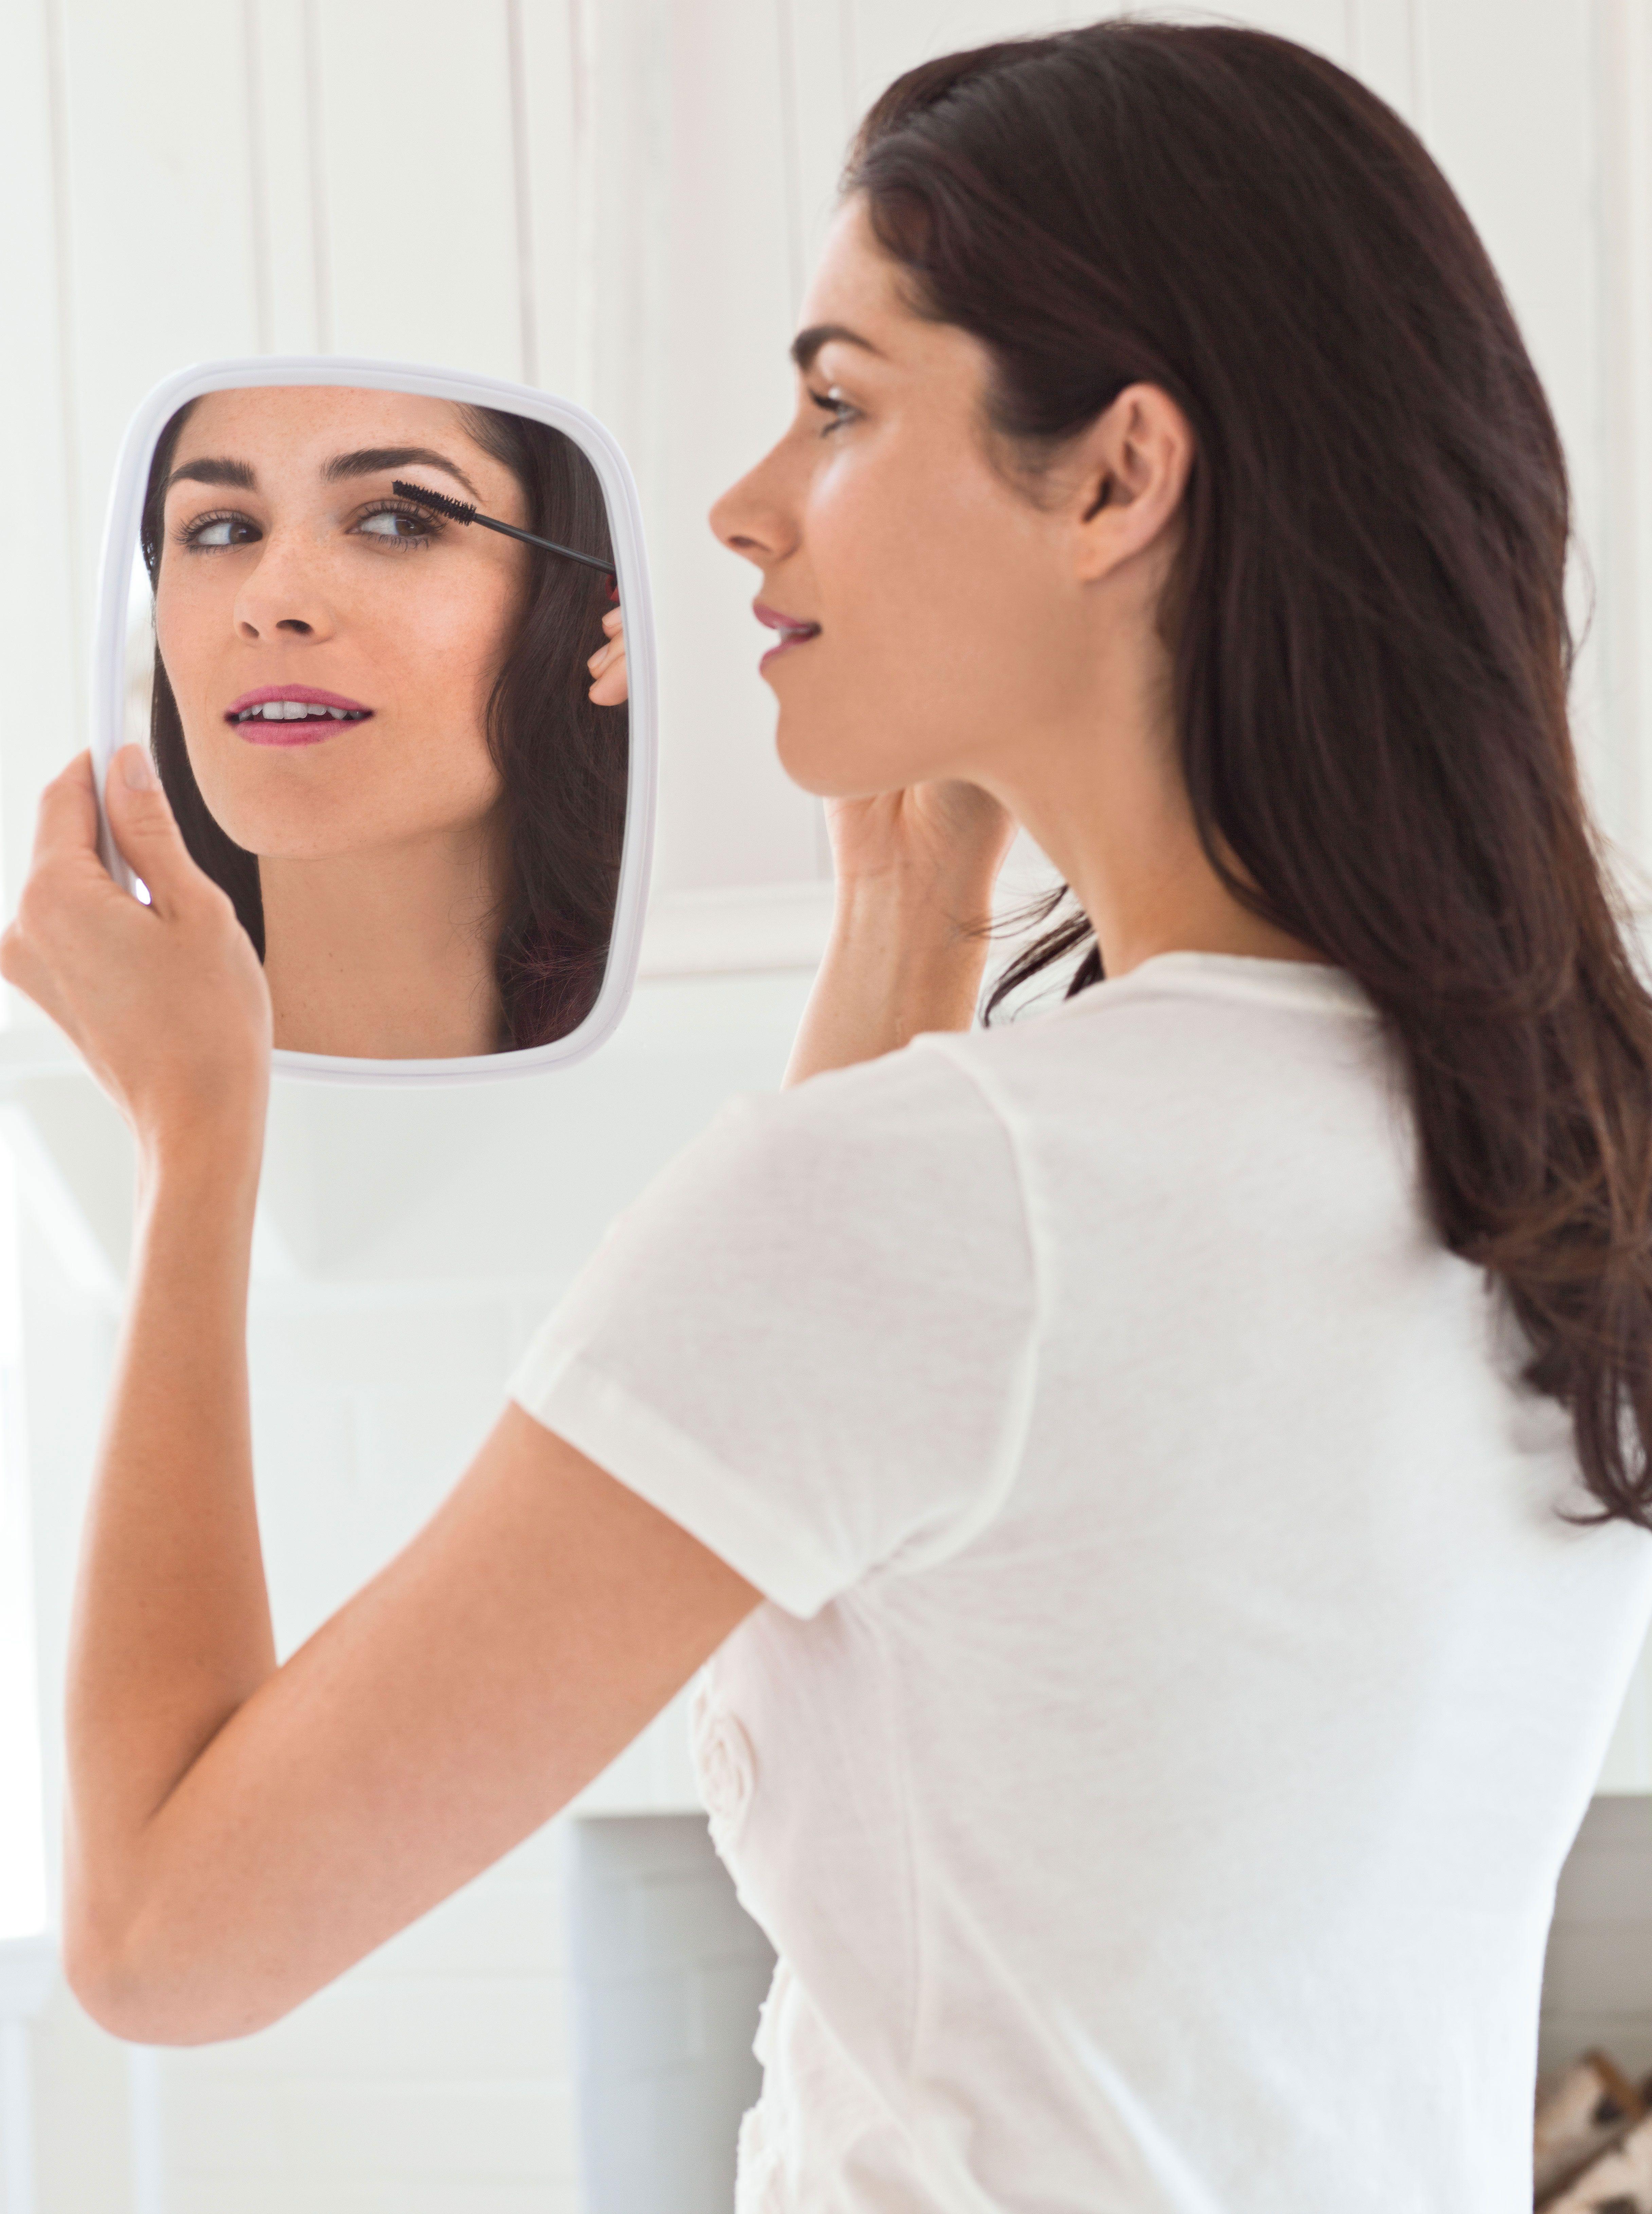 5 Minute Makeup Tips 5 minute makeup tips, Hair beauty